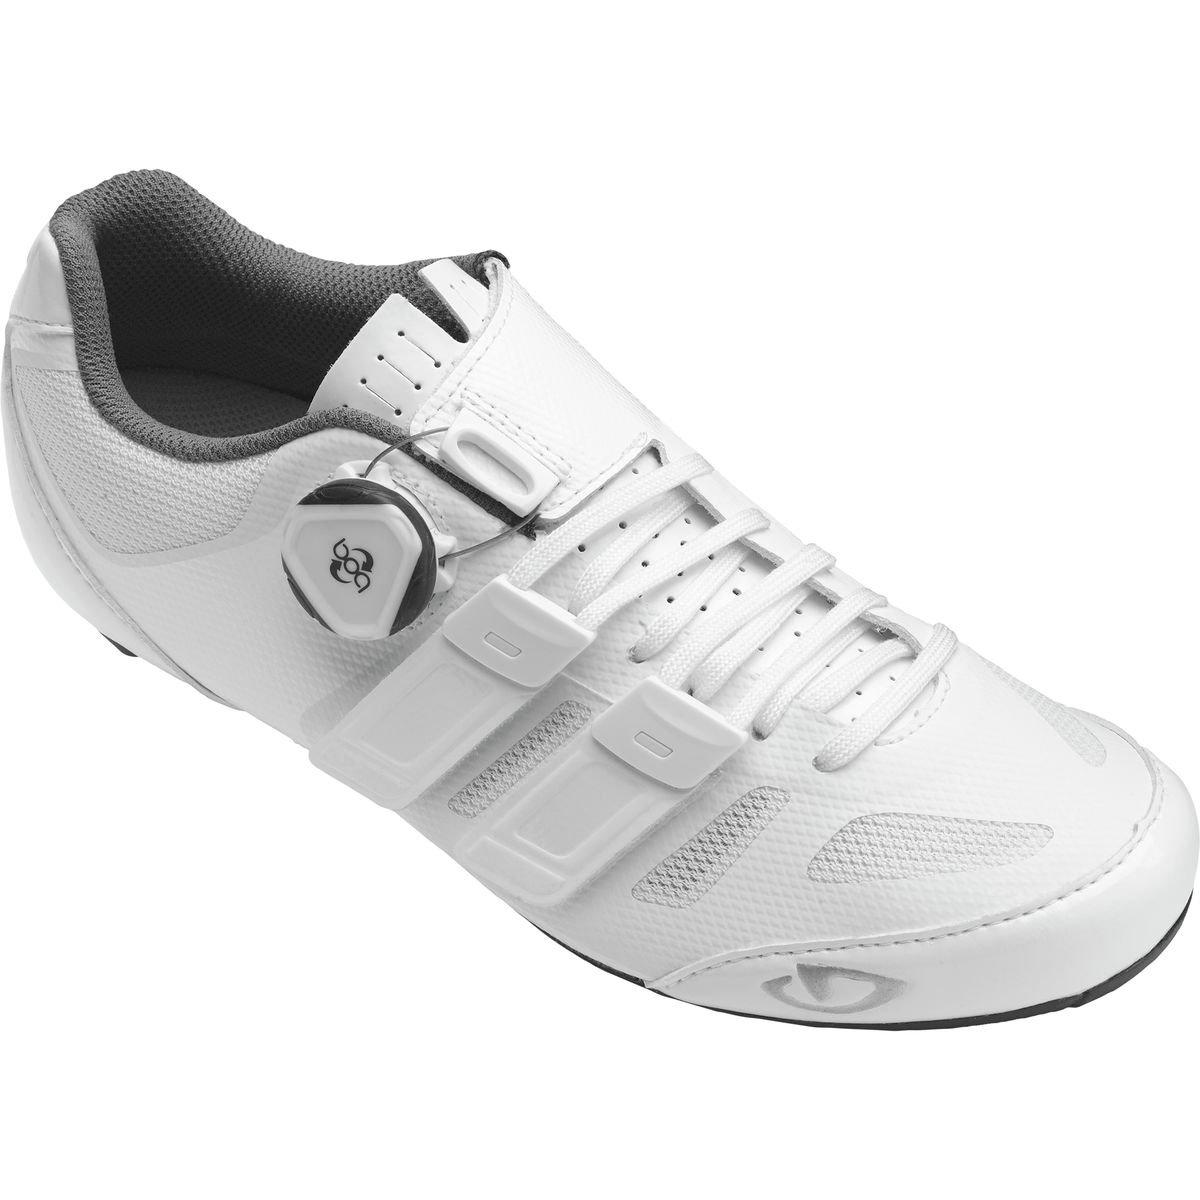 Giro 2017 Womens Rae'S Techlace Road Cycling Shoes (White - 39.5)